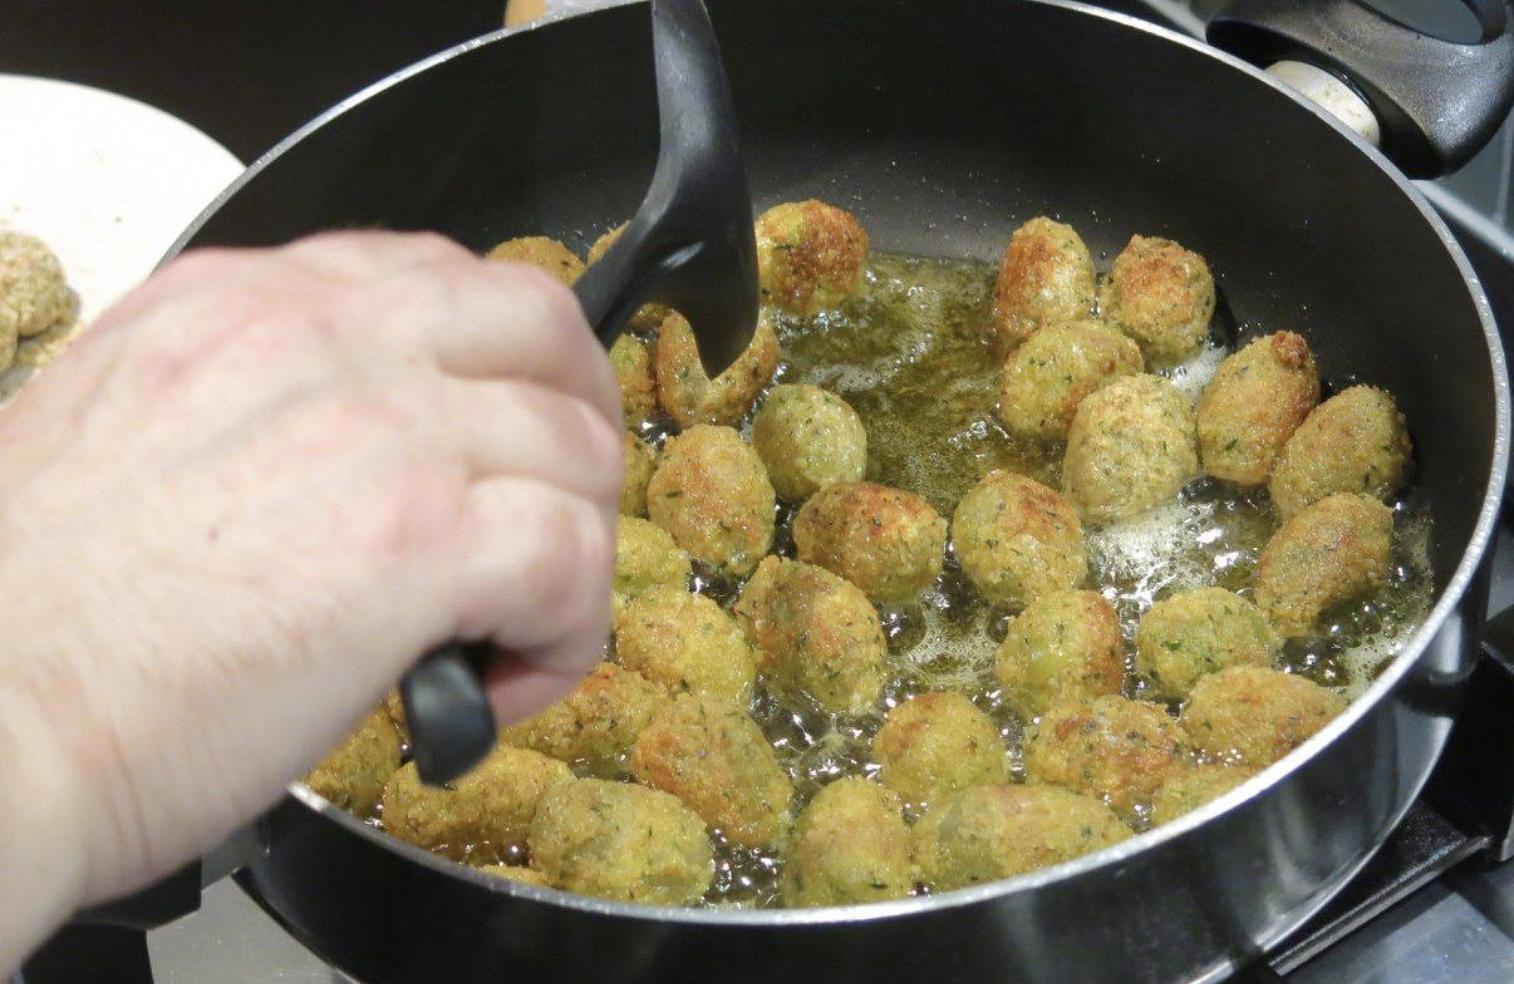 Making Ascolani olives